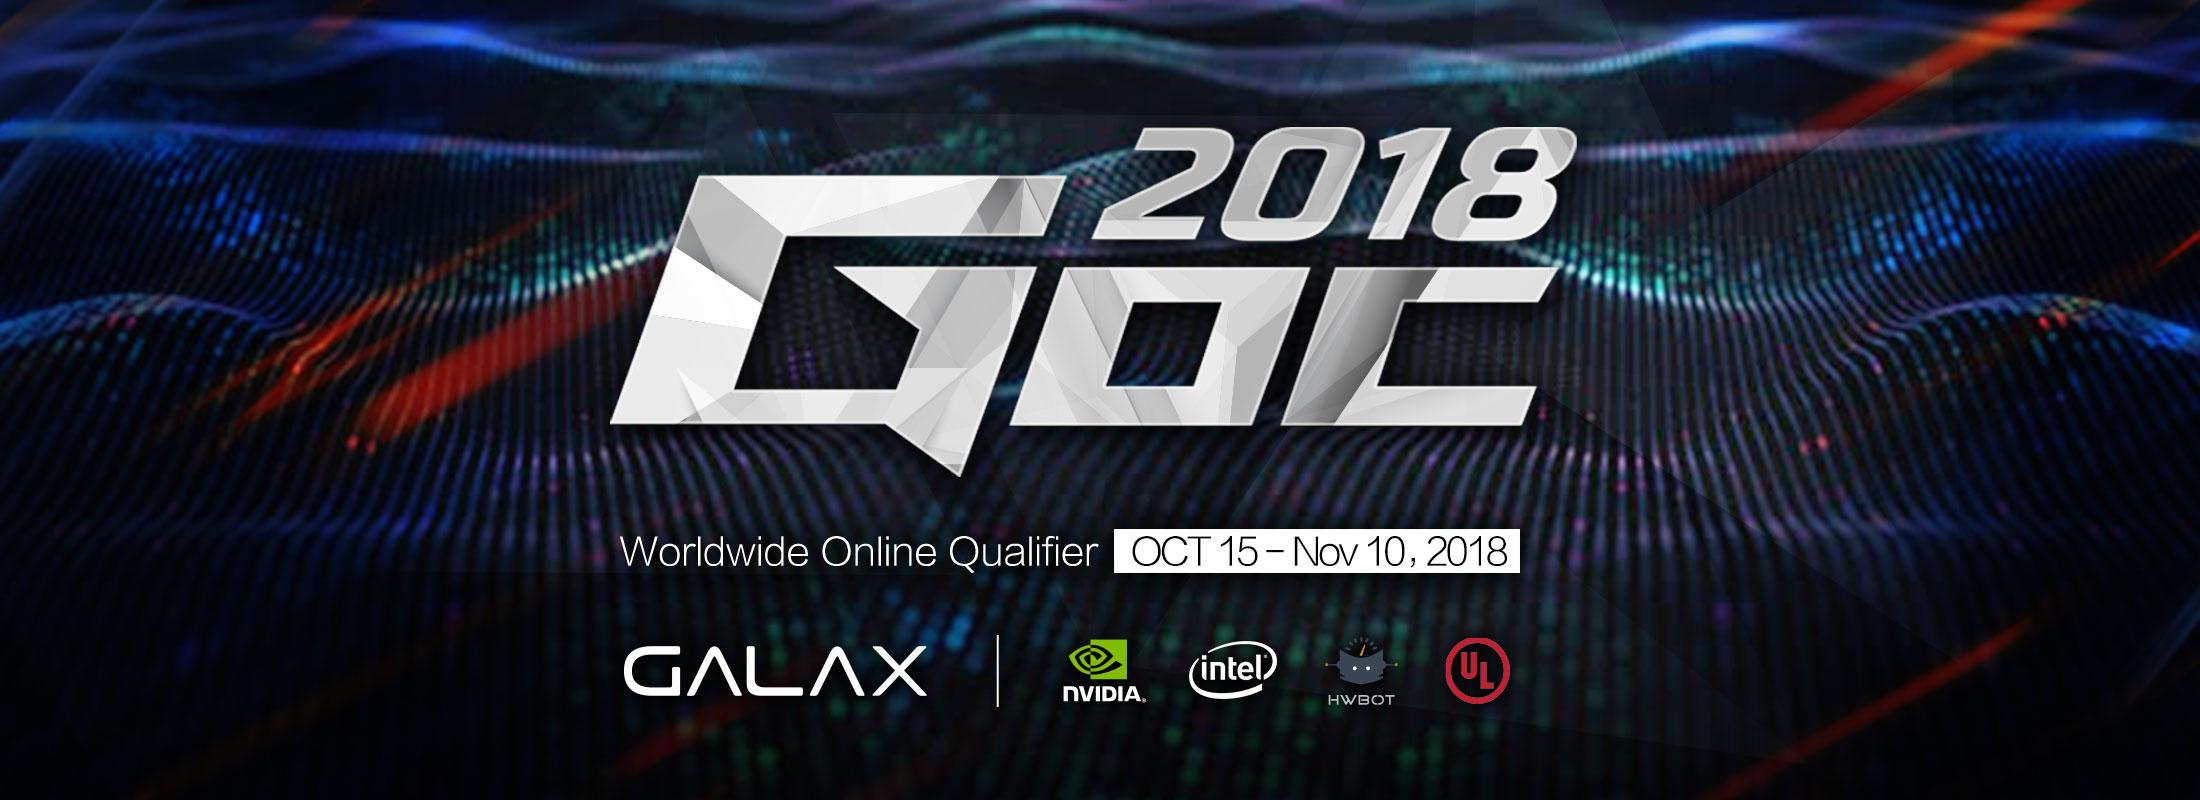 pr galax goc 2018 1  ขอเชิญนักโอเวอร์คล็อกเข้าร่วมการแข่งขันโอเวอร์คล็อก GALAX GOC 2018 ในรอบ Worldwide Online Qualifier